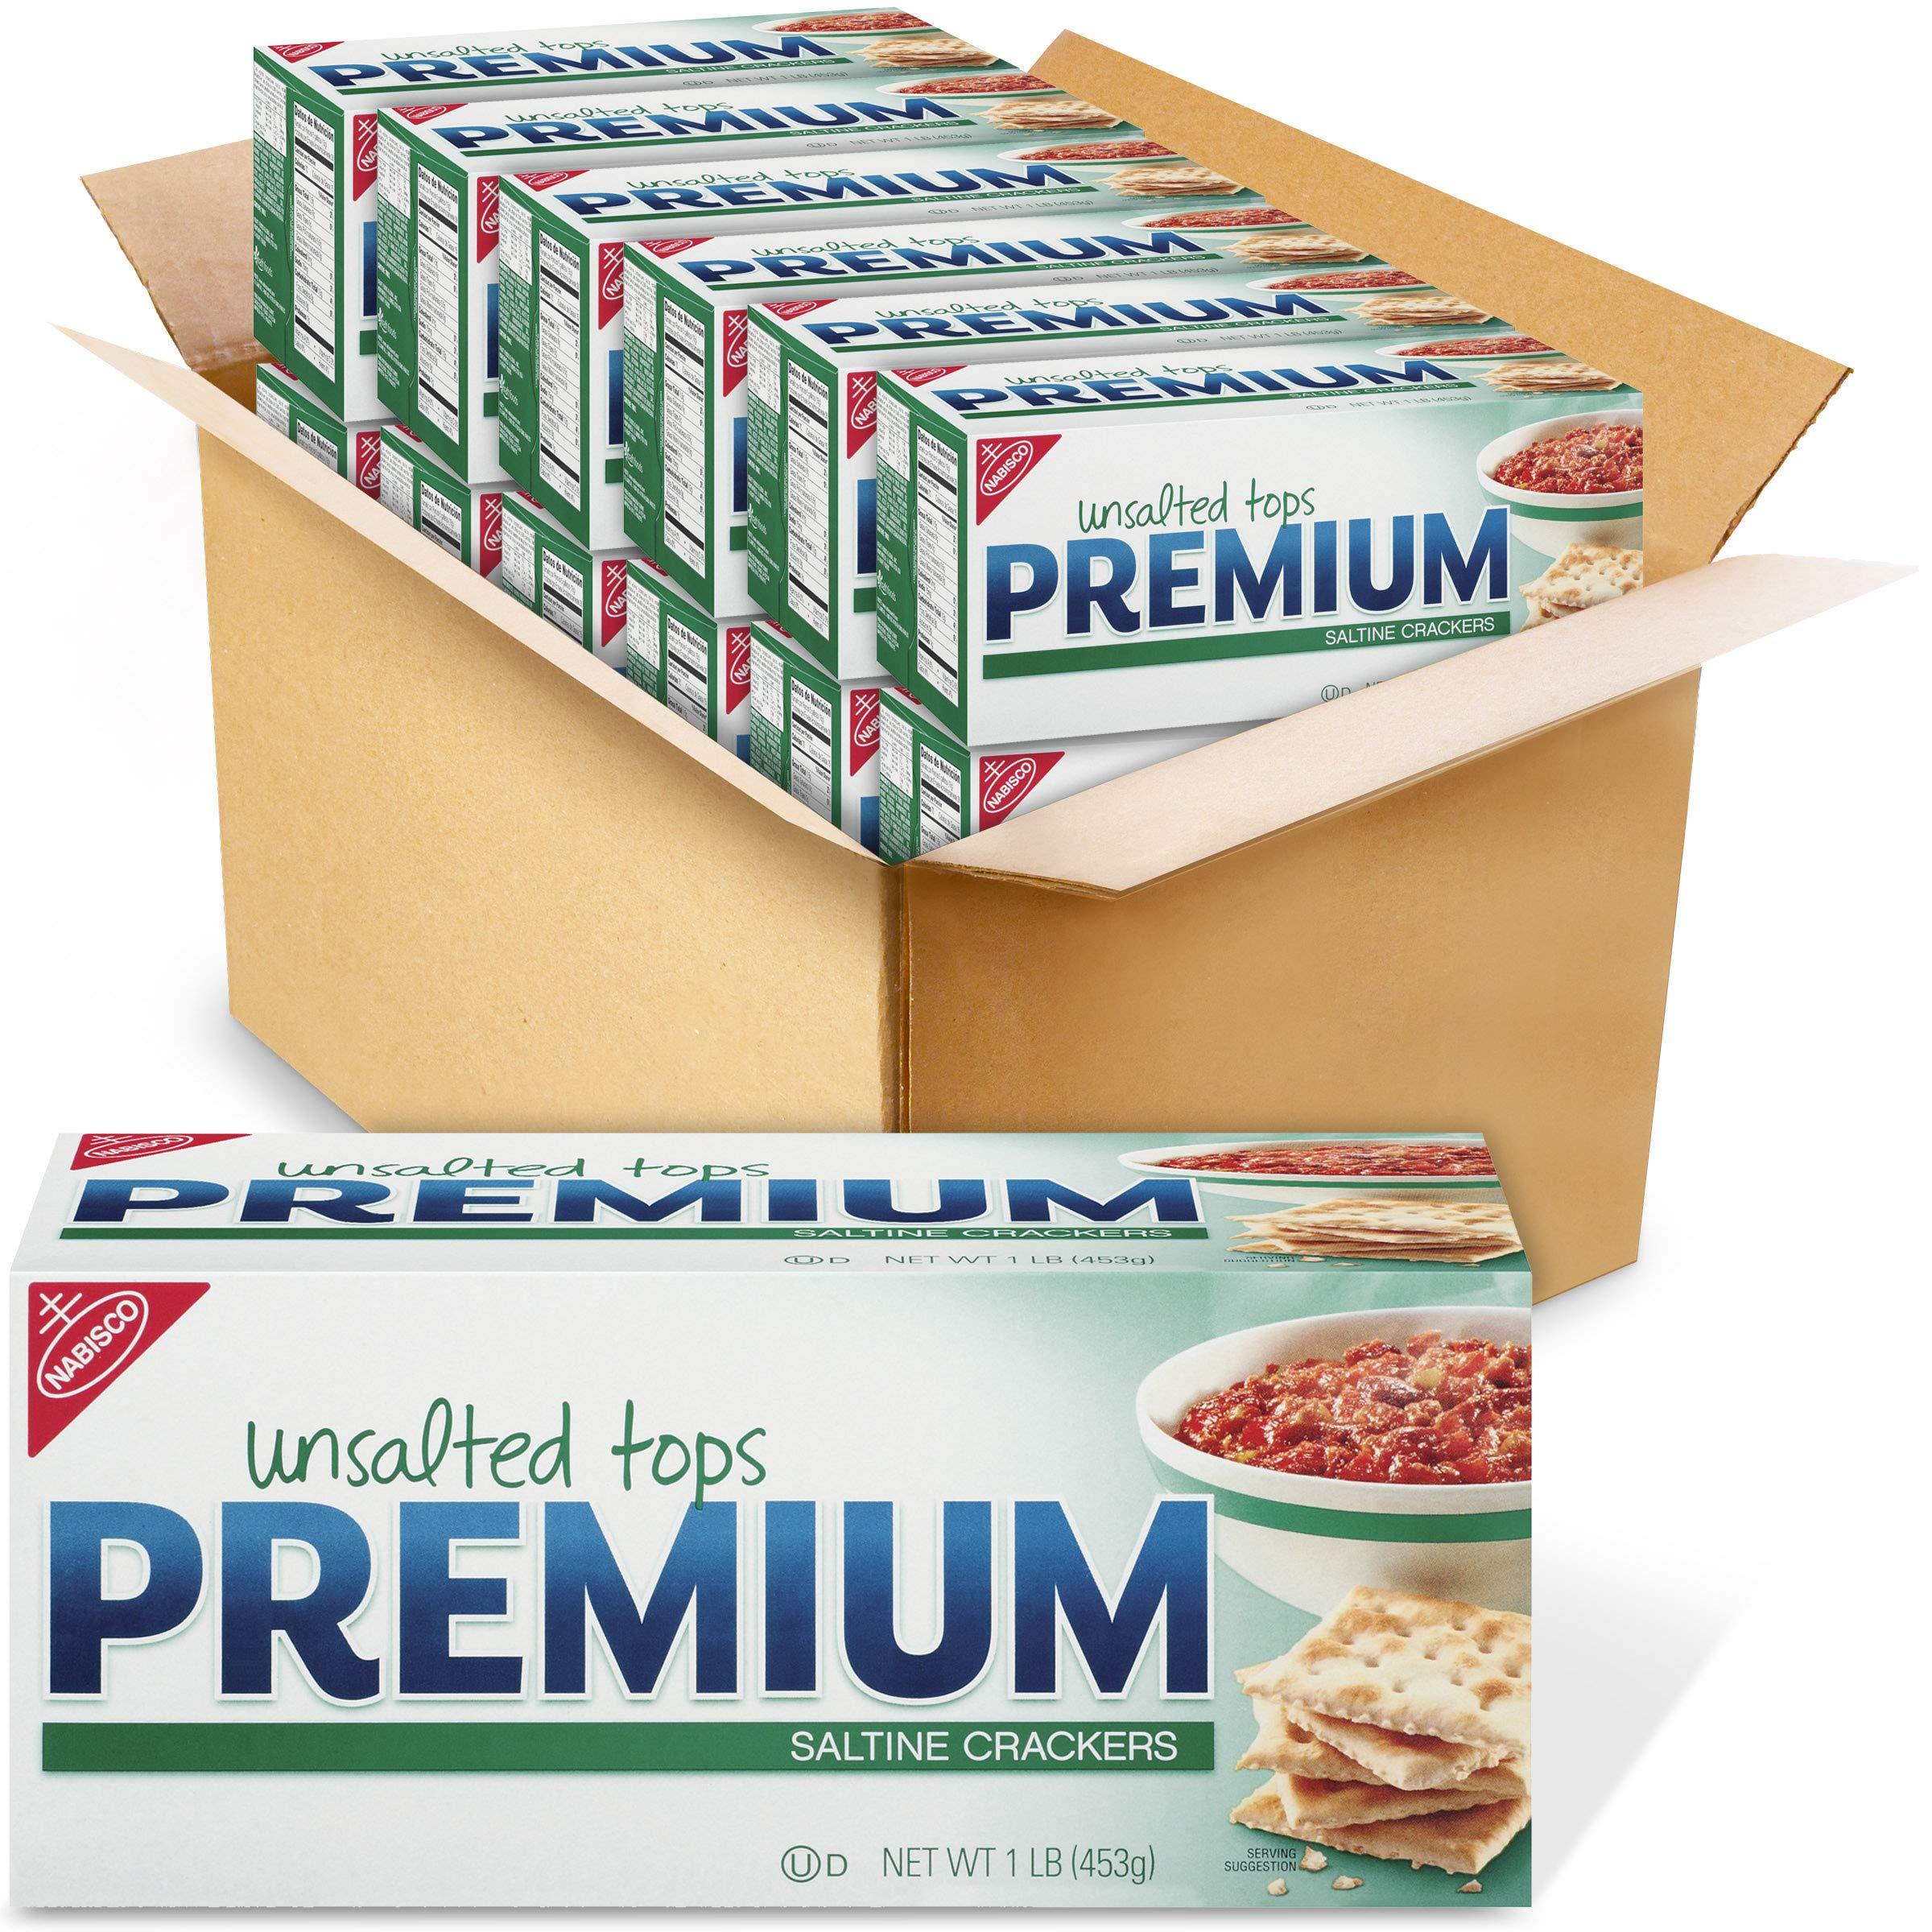 Premium Unsalted Tops Saltine Crackers, 12 - 16 oz Boxes